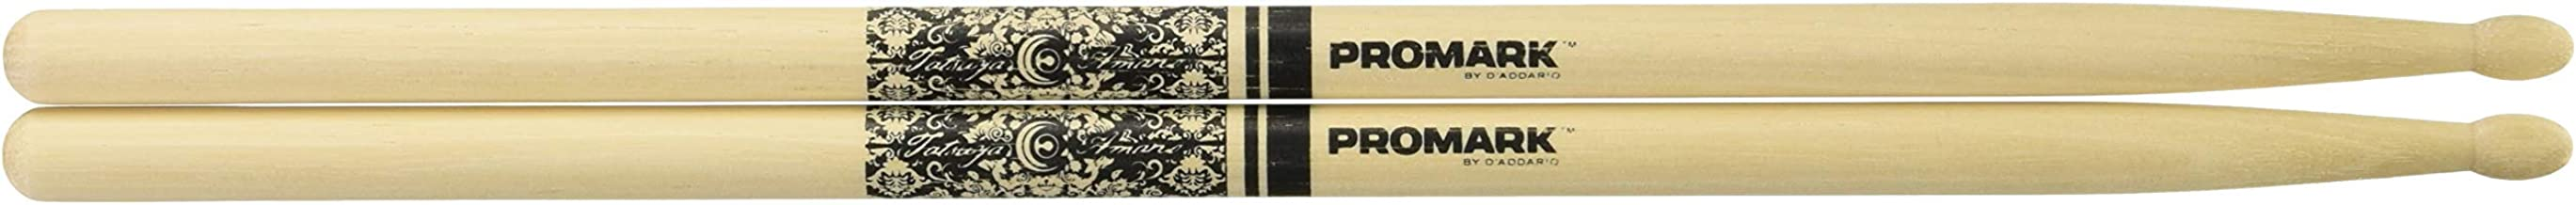 PROMARK プロマーク ドラムスティック Tatsuya Amano シグネチャーモデル 5B TXR5BW-TA (406 x 15.0mm) 【国内正規品】